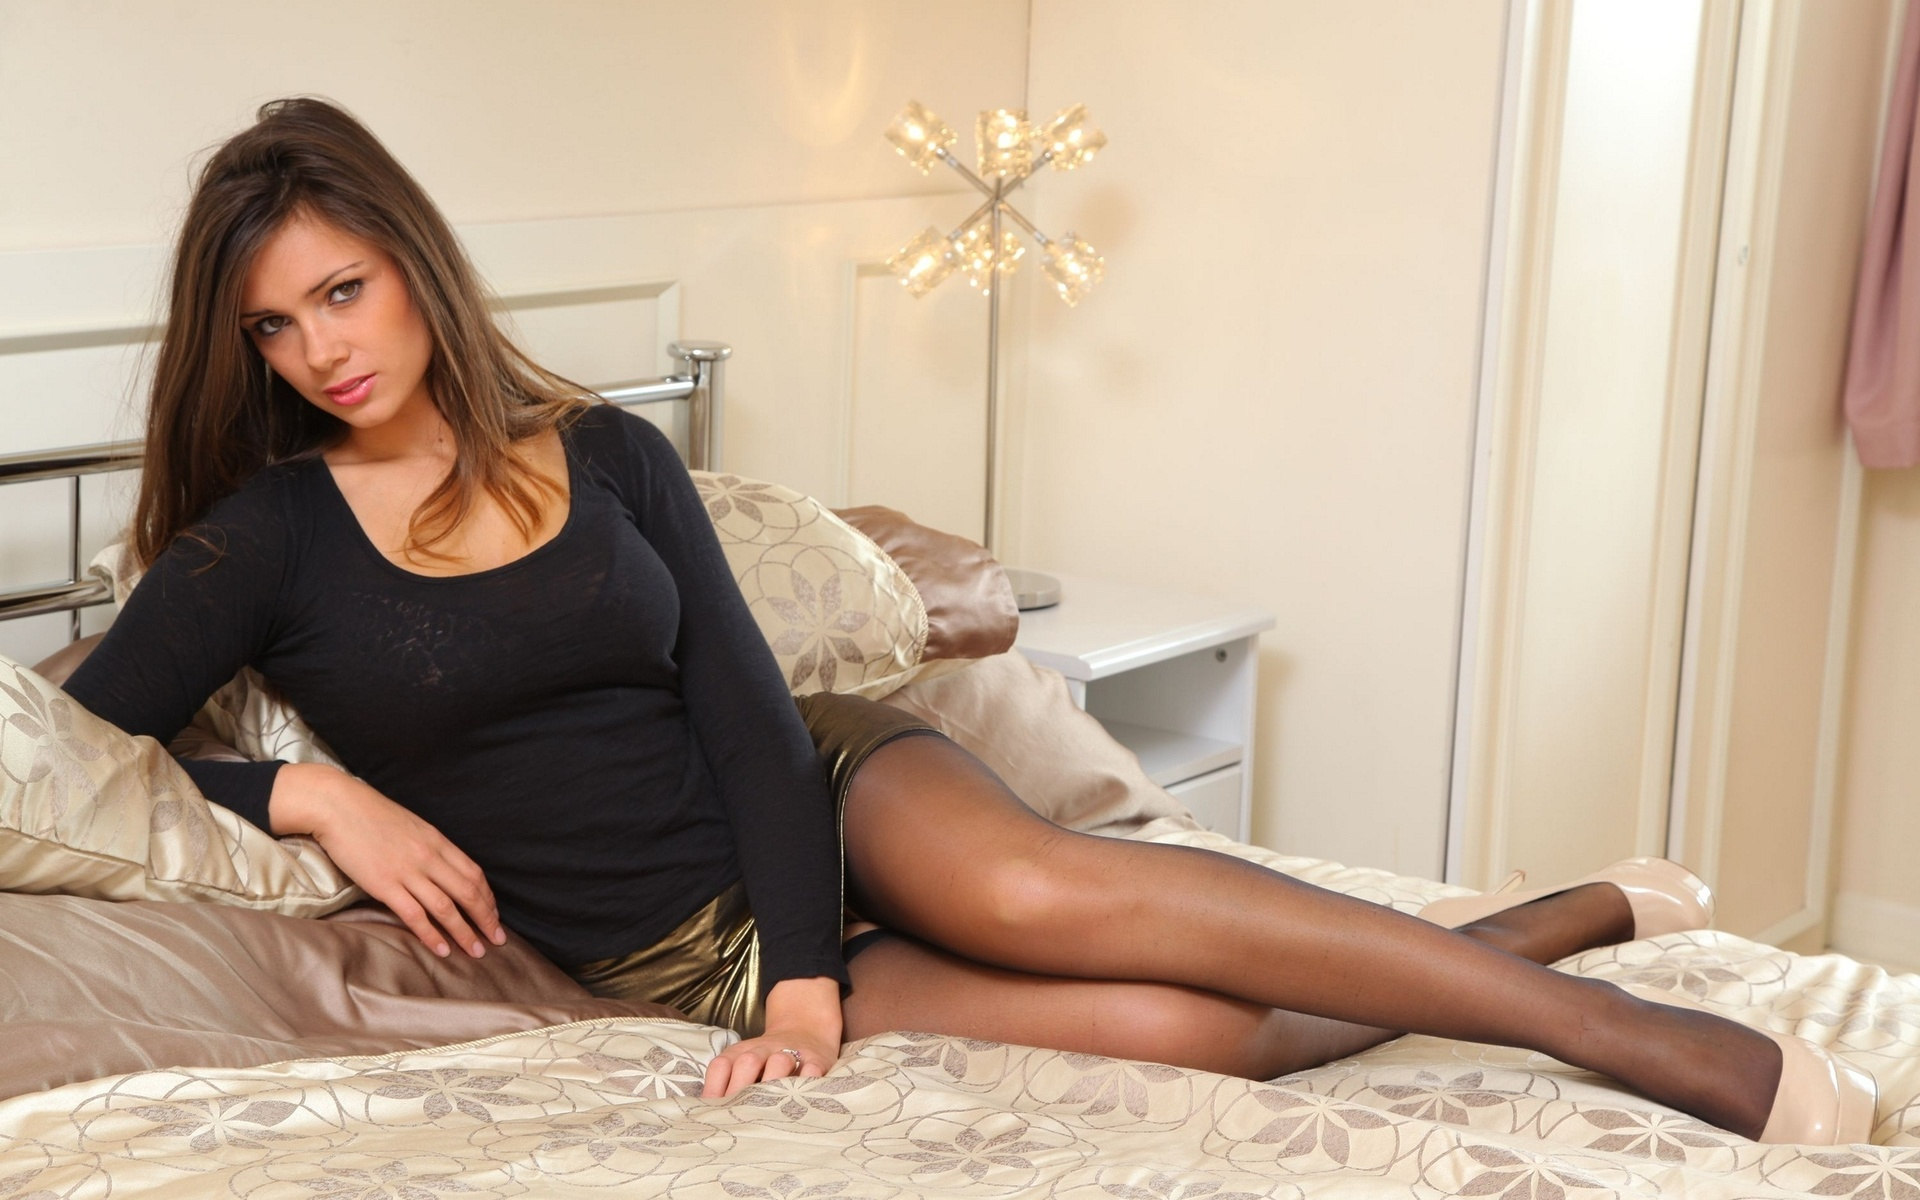 приличная девушка сидит на диване в короткой юбке материалы